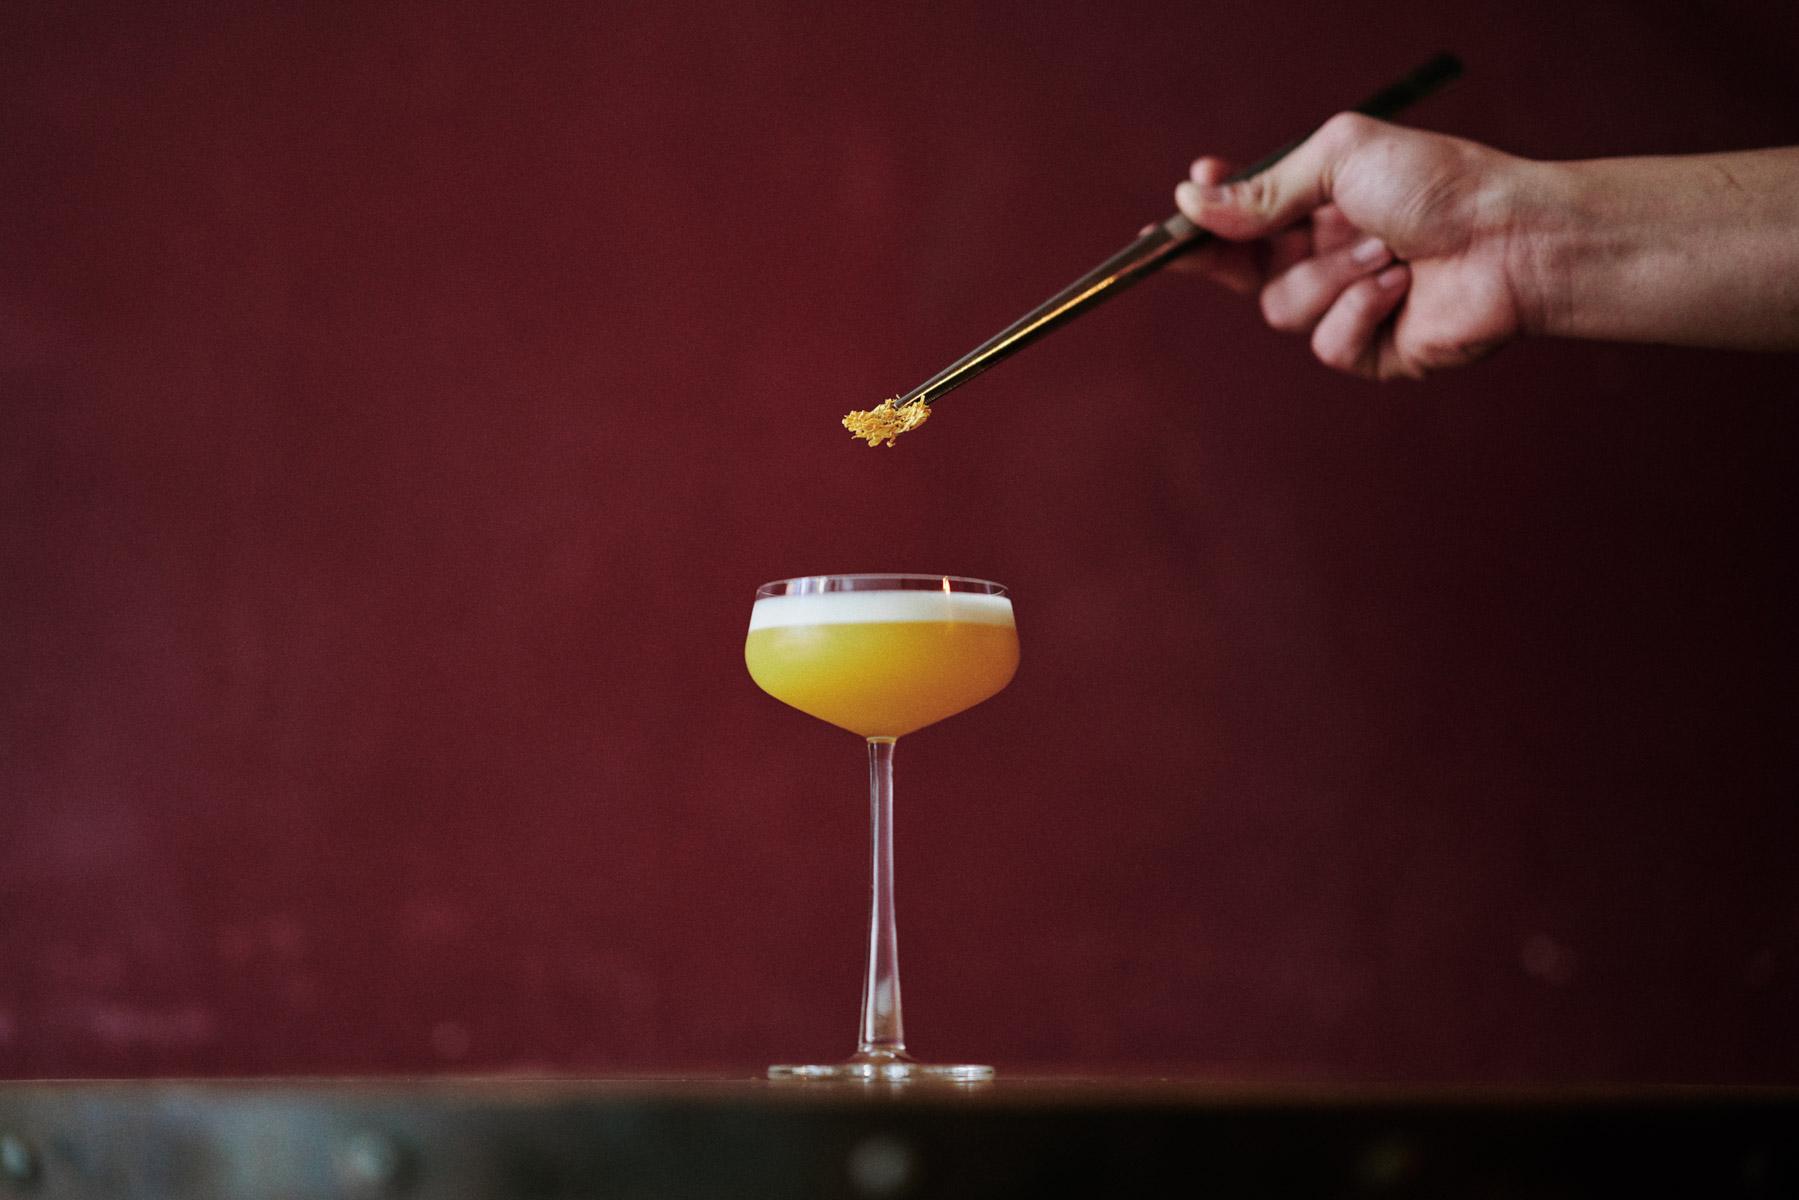 A bartender putting a final garnish on a cocktail at Ne Bar in Hanoi, Vietnam.